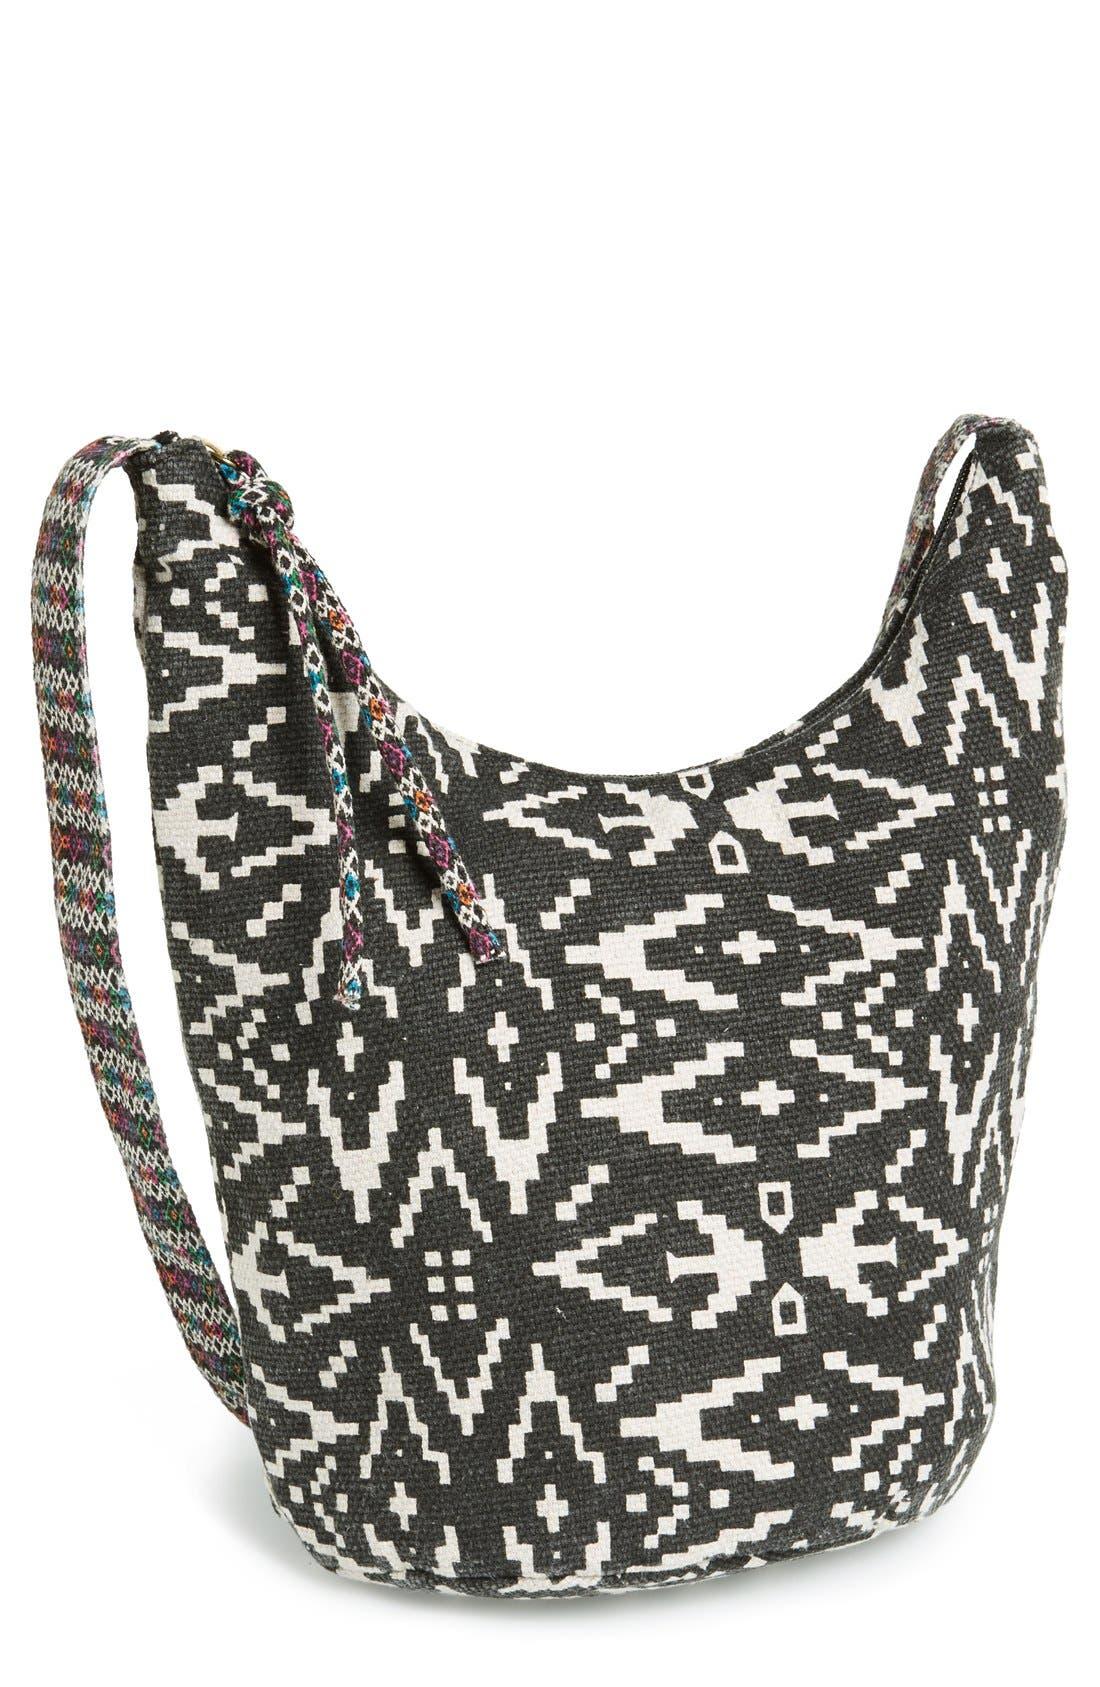 Alternate Image 1 Selected - Lulu Geo Print Canvas Crossbody Bag (Juniors) (Online Only)